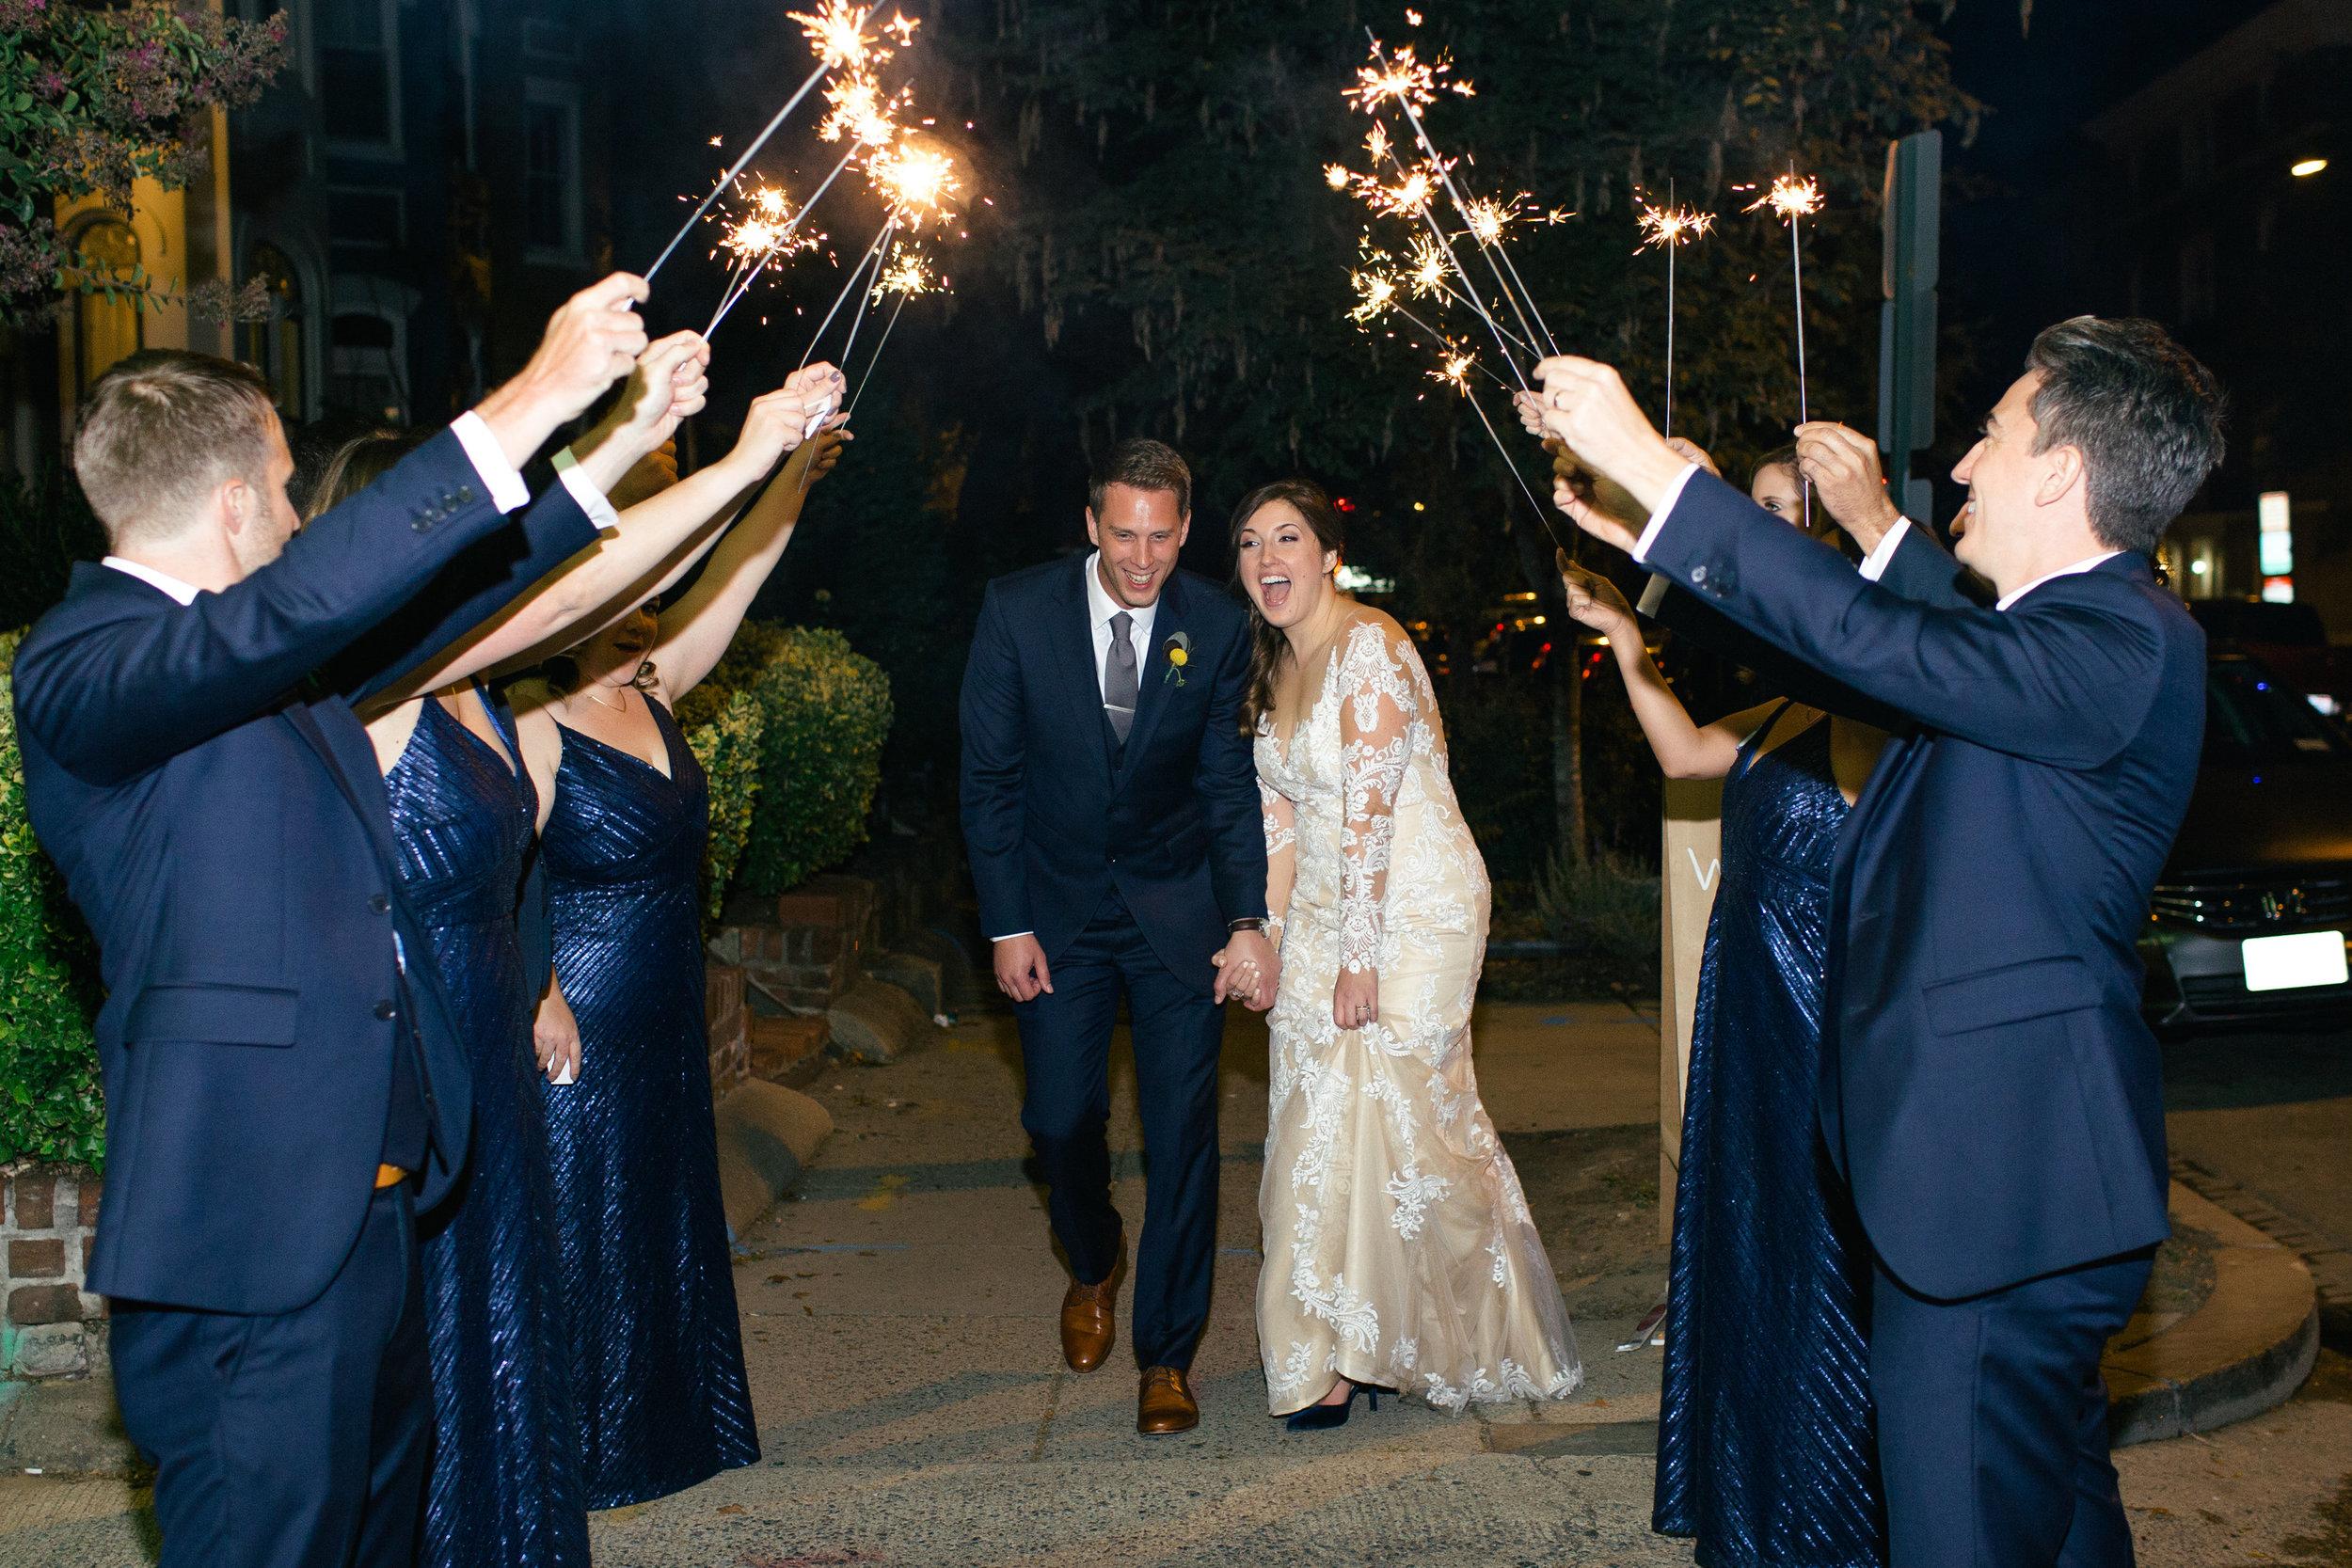 Dupon Circle Wedding | Washington DC Wedding Photography | Rebecca Wilcher Photography -38.jpg